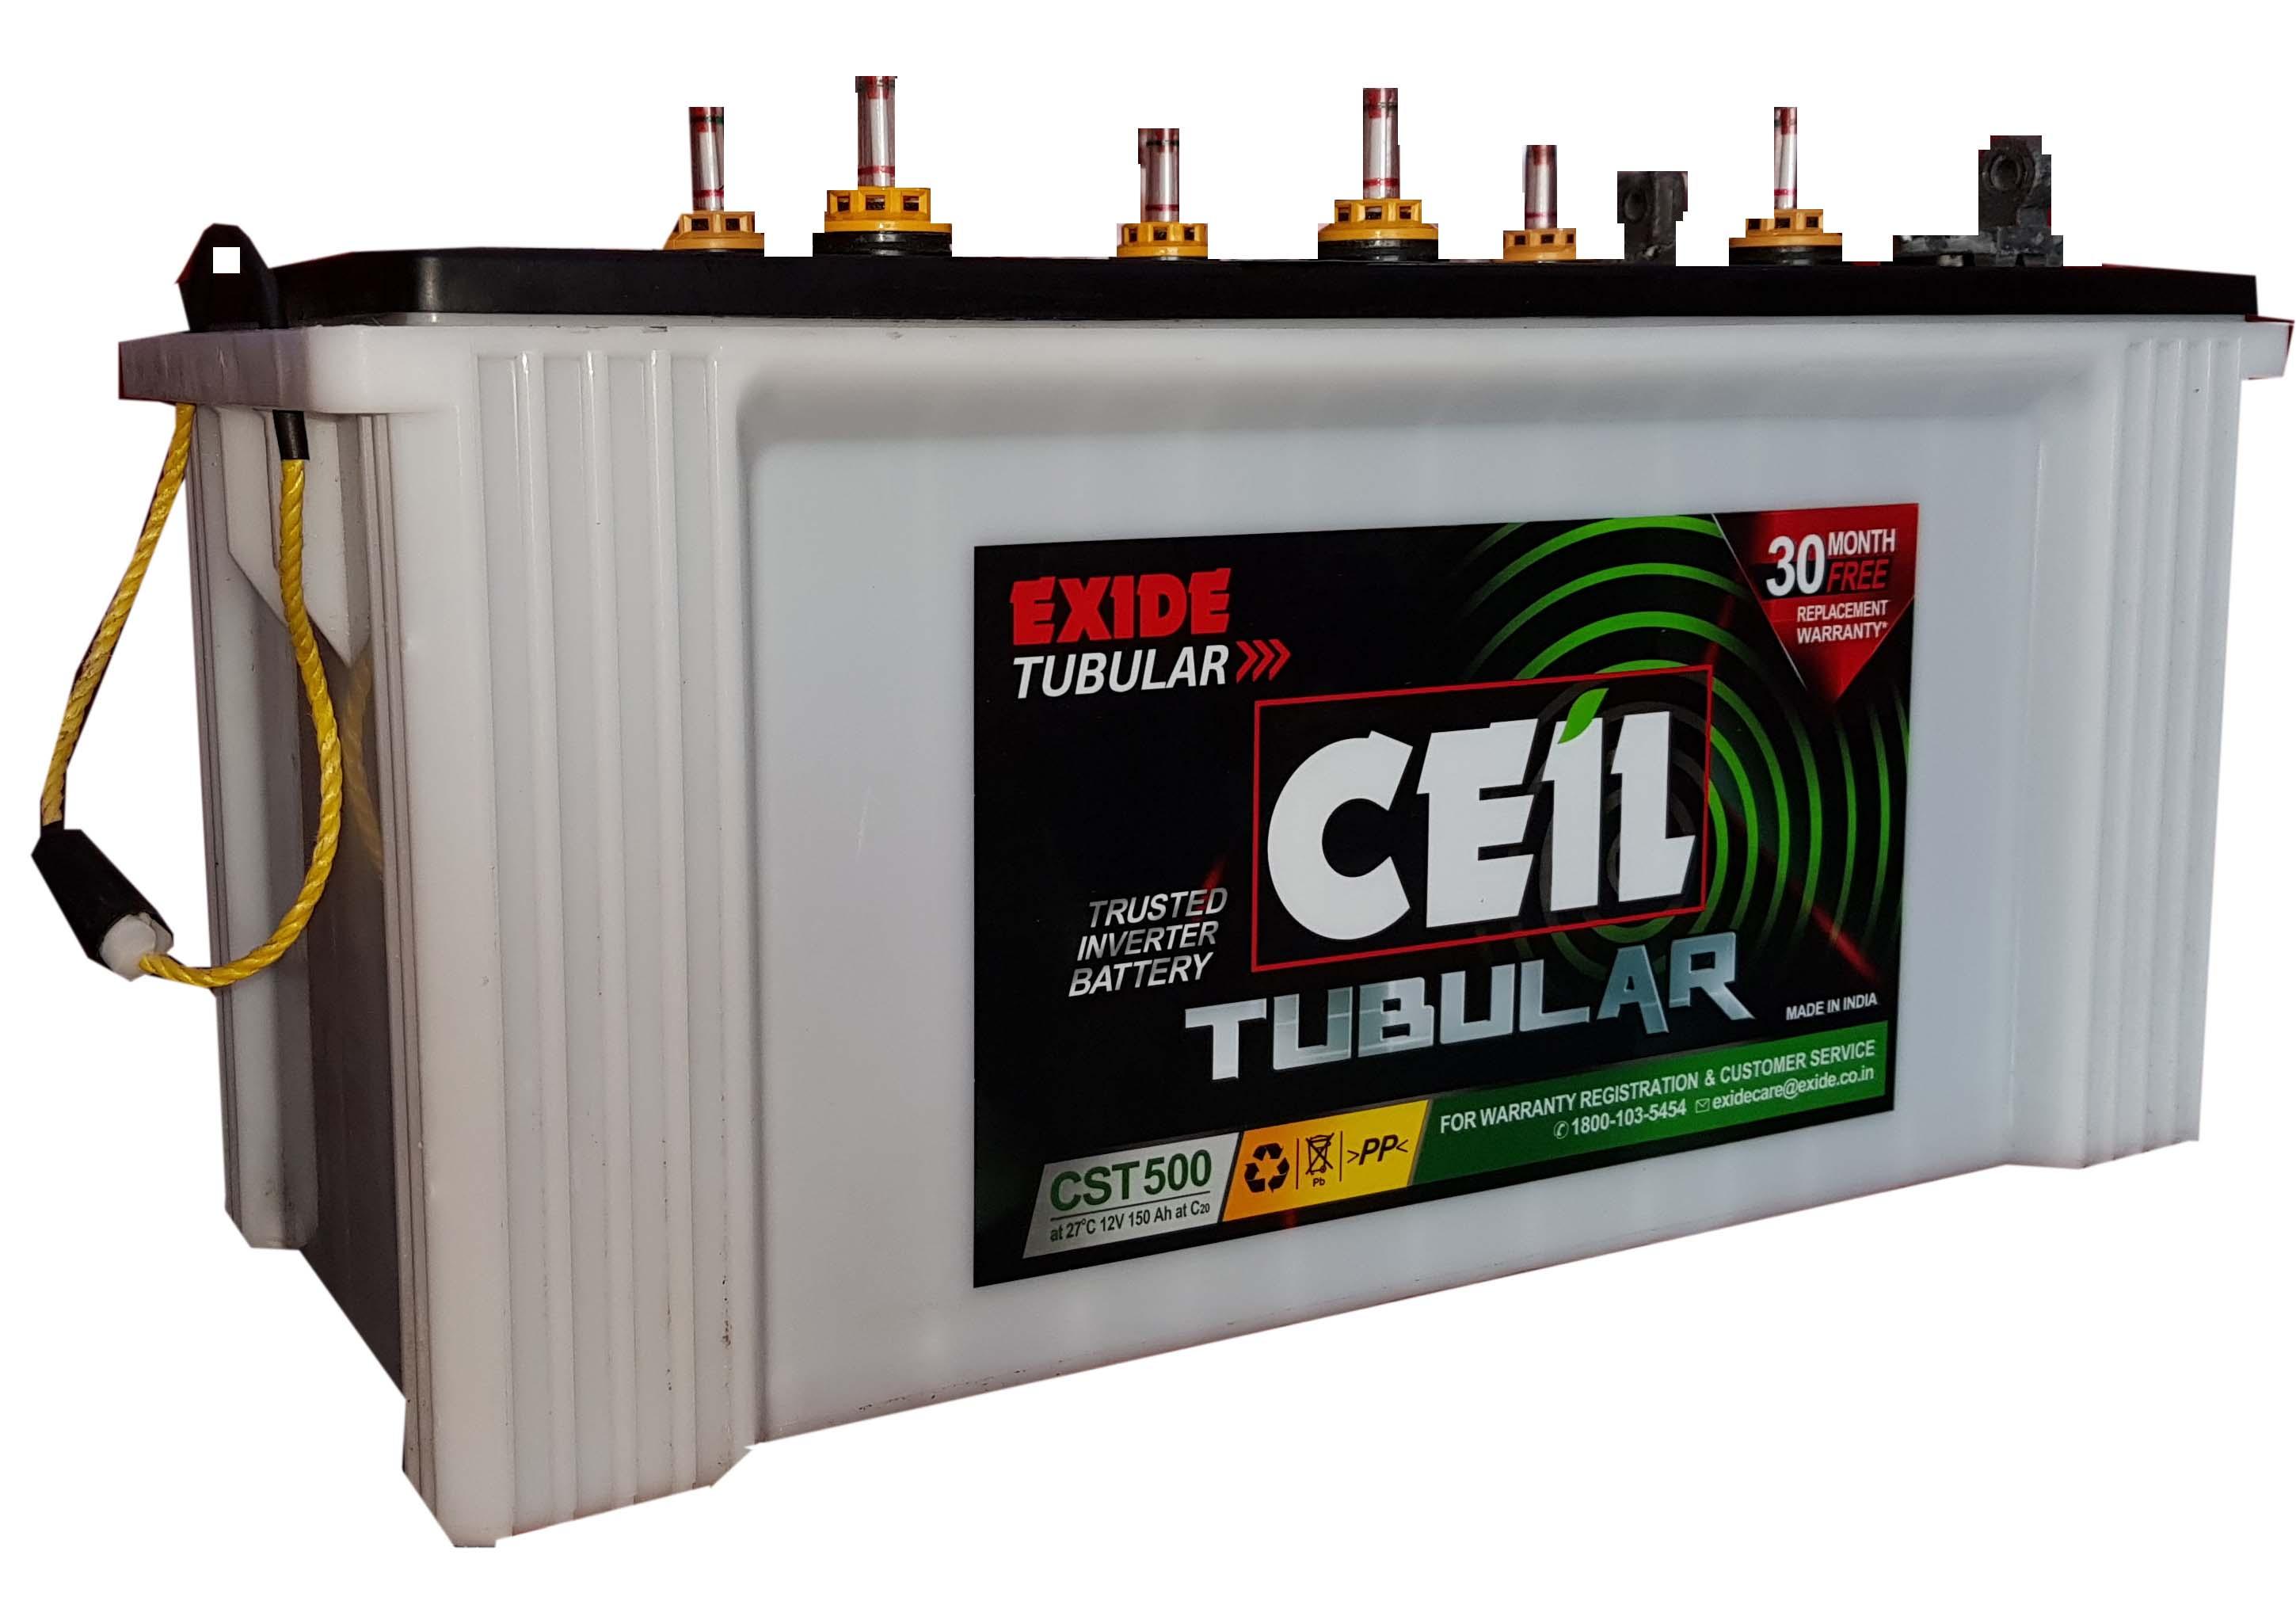 exide ceil small tubular battery cst500